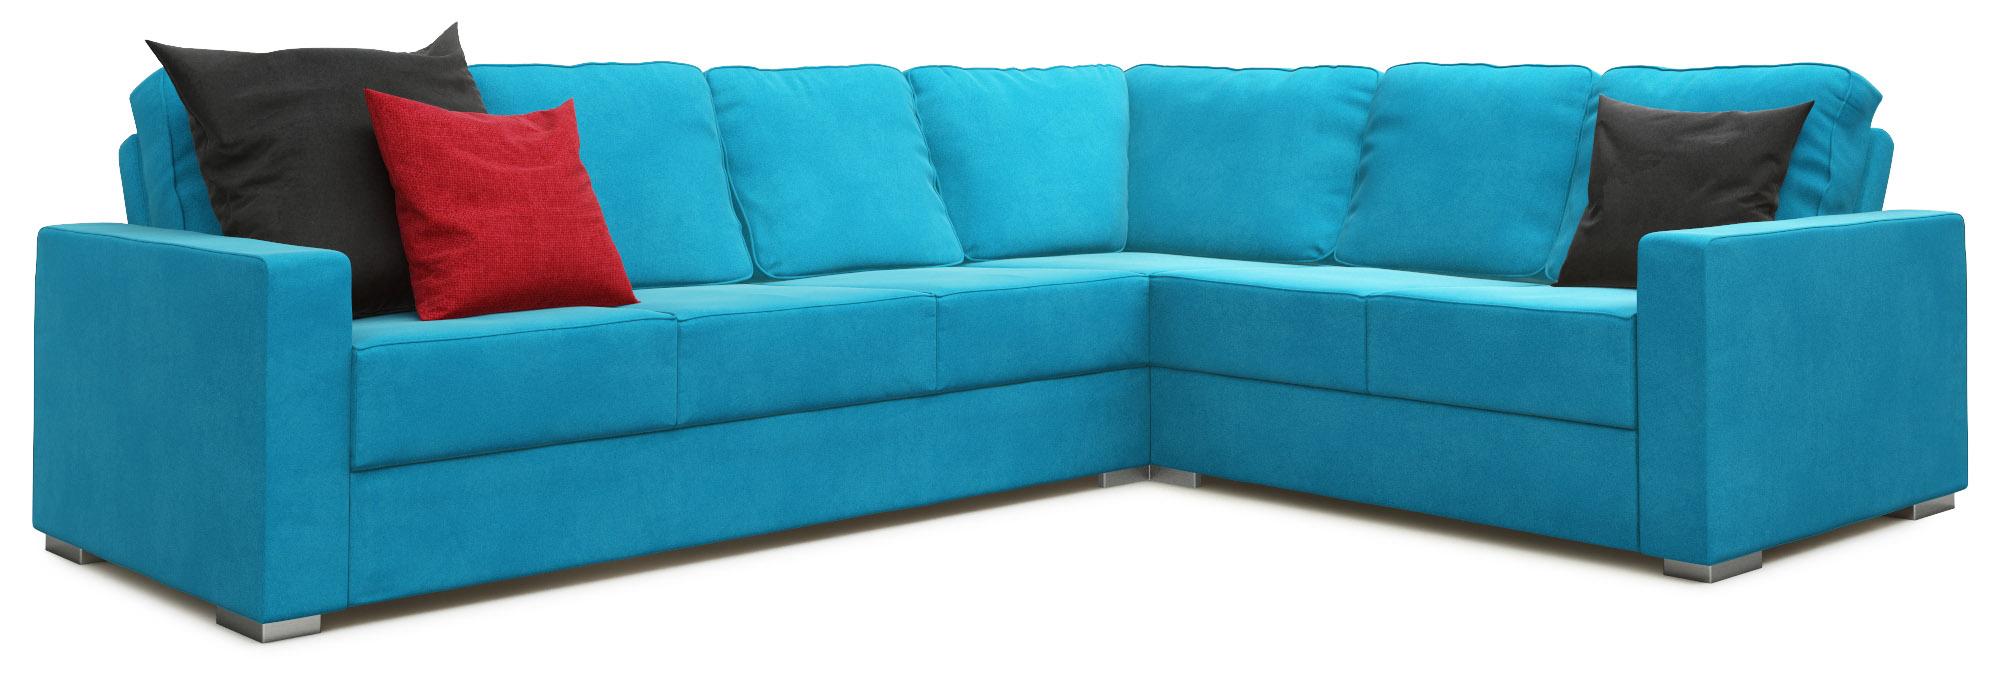 Lear 4X3 Corner Double Sofa Bed